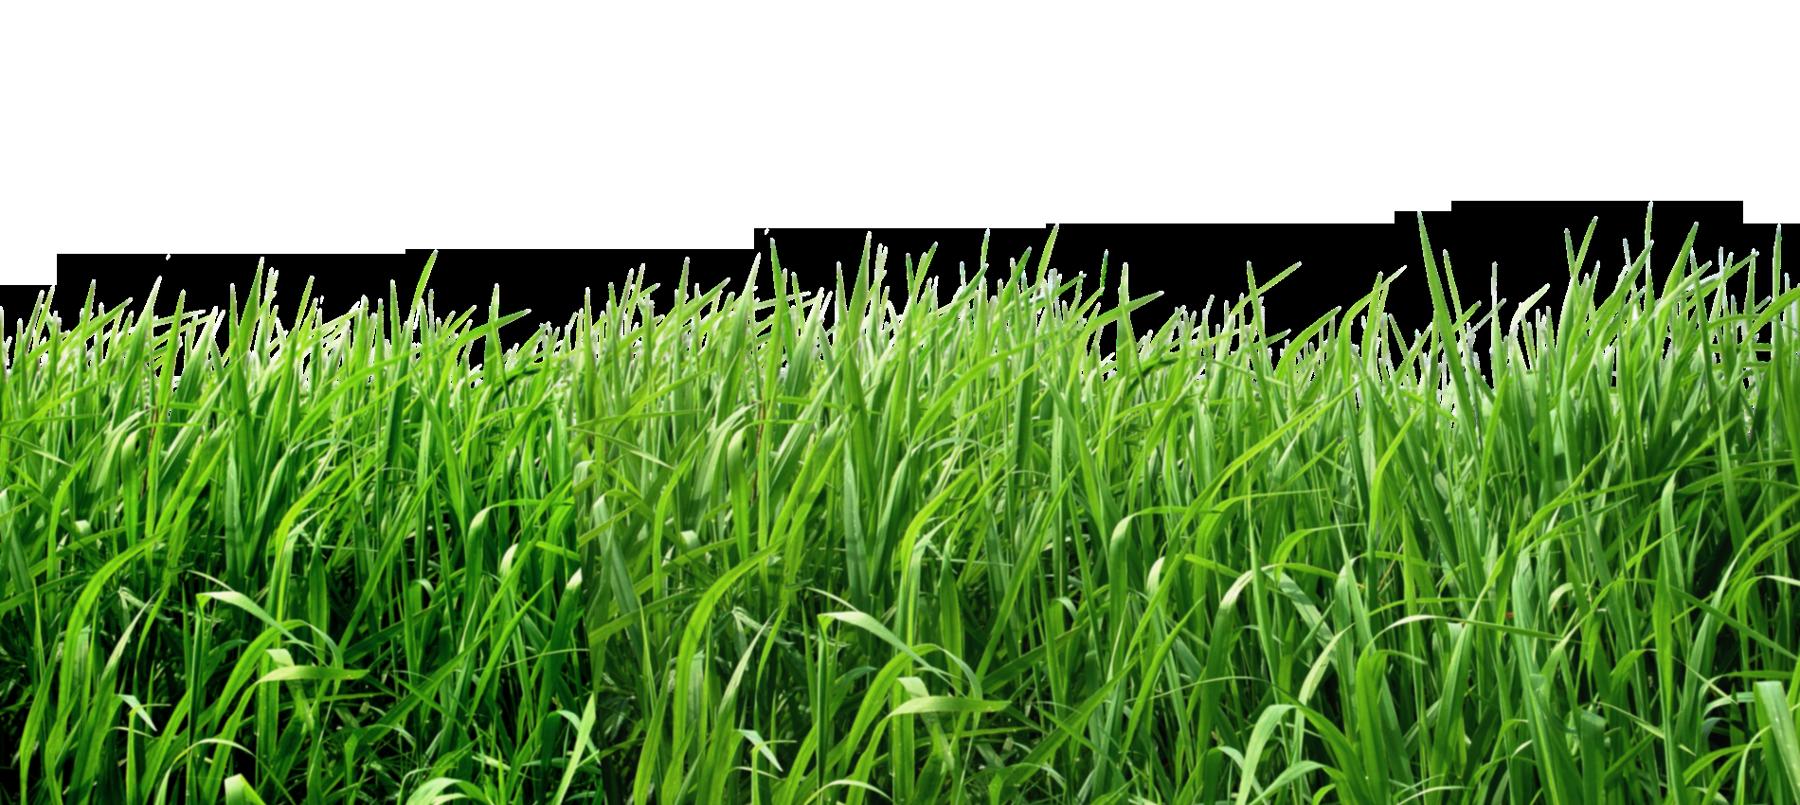 Grass Clipart Crop Grass Crop Transparent Free For Download On Webstockreview 2021